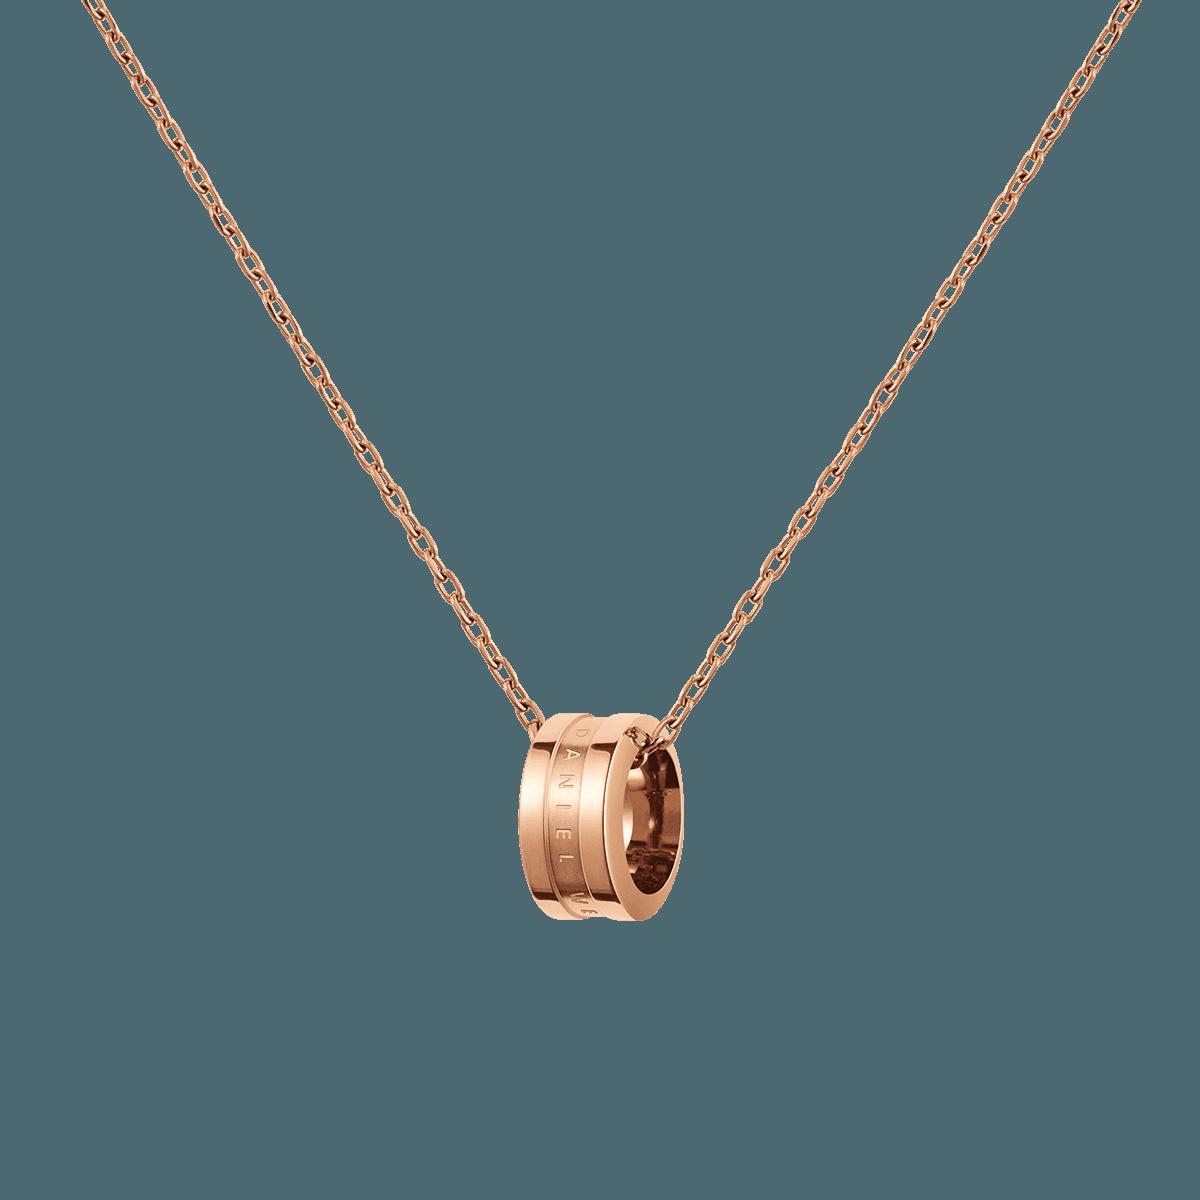 Elan Necklace Rose Gold One Size